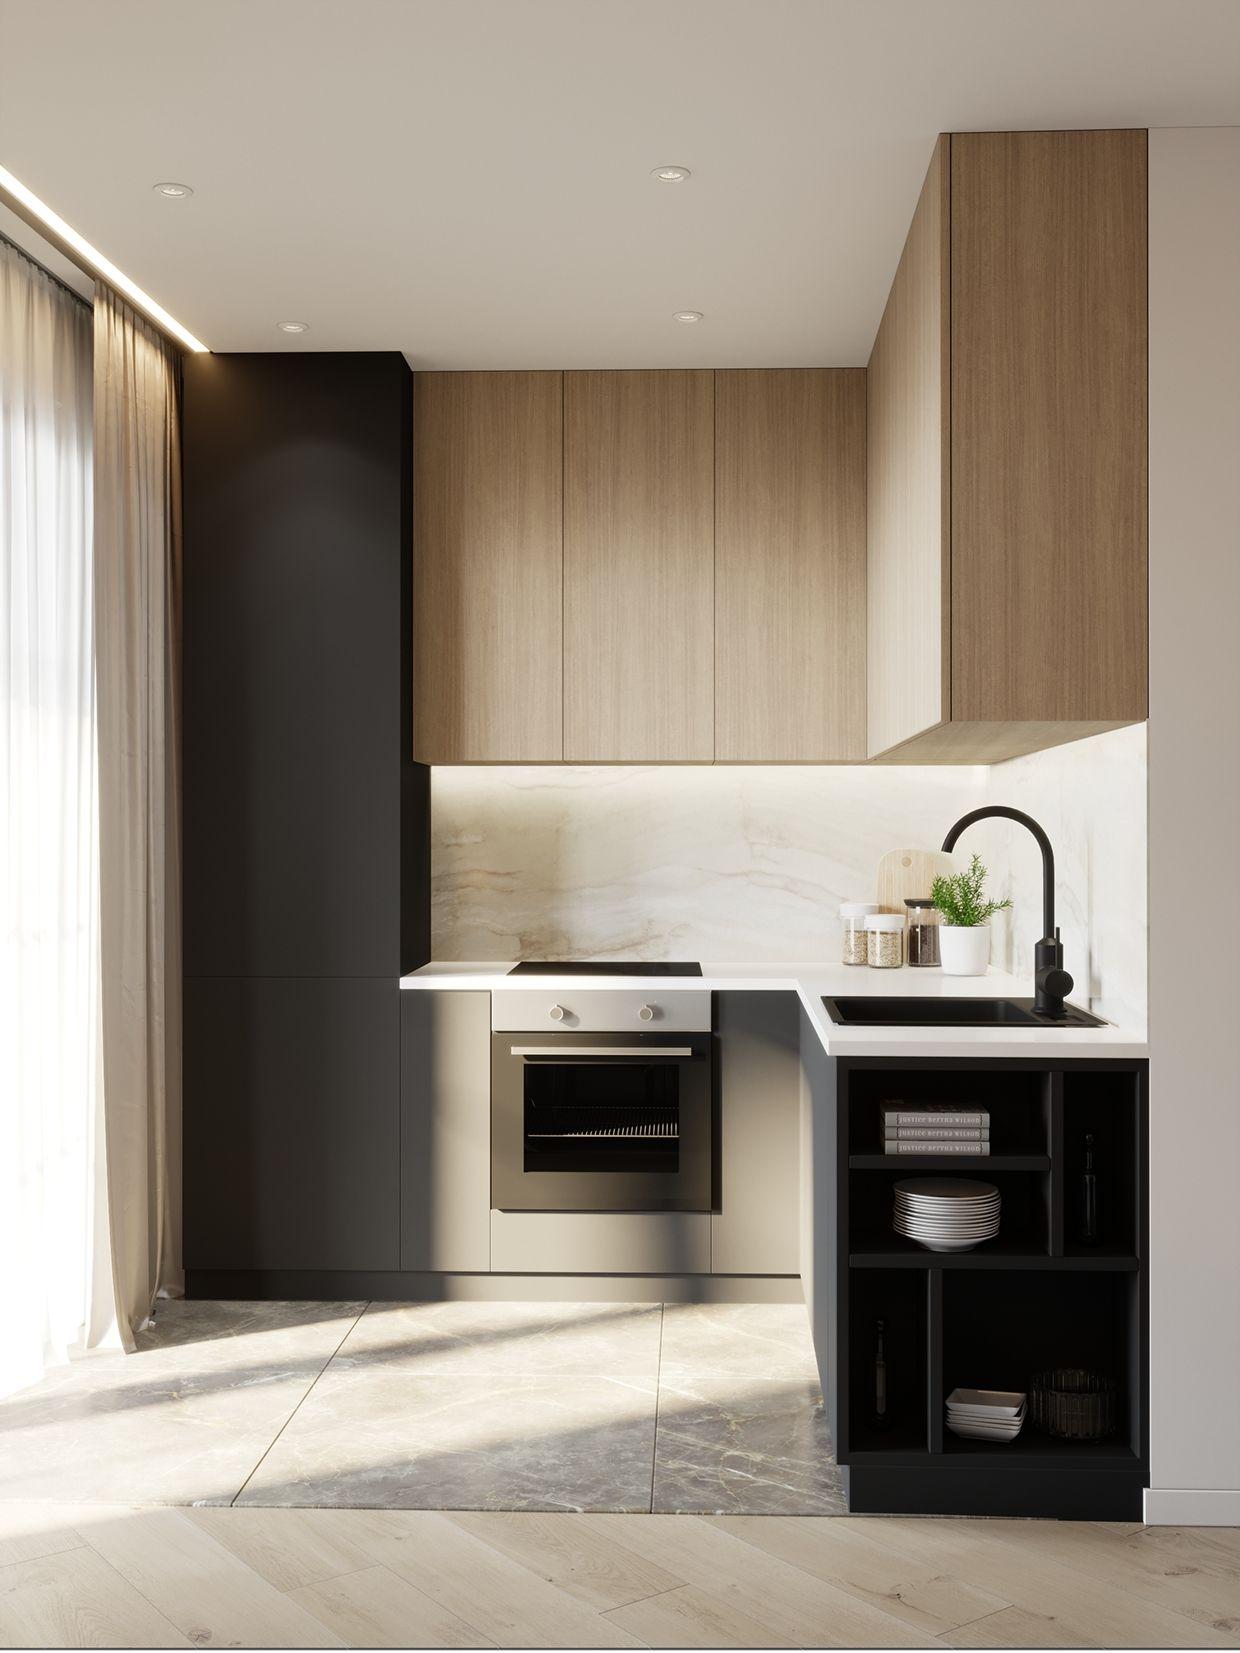 64184459405925.5a20a421d8eac.jpg (1240×1653) | Kitchen | Pinterest ...